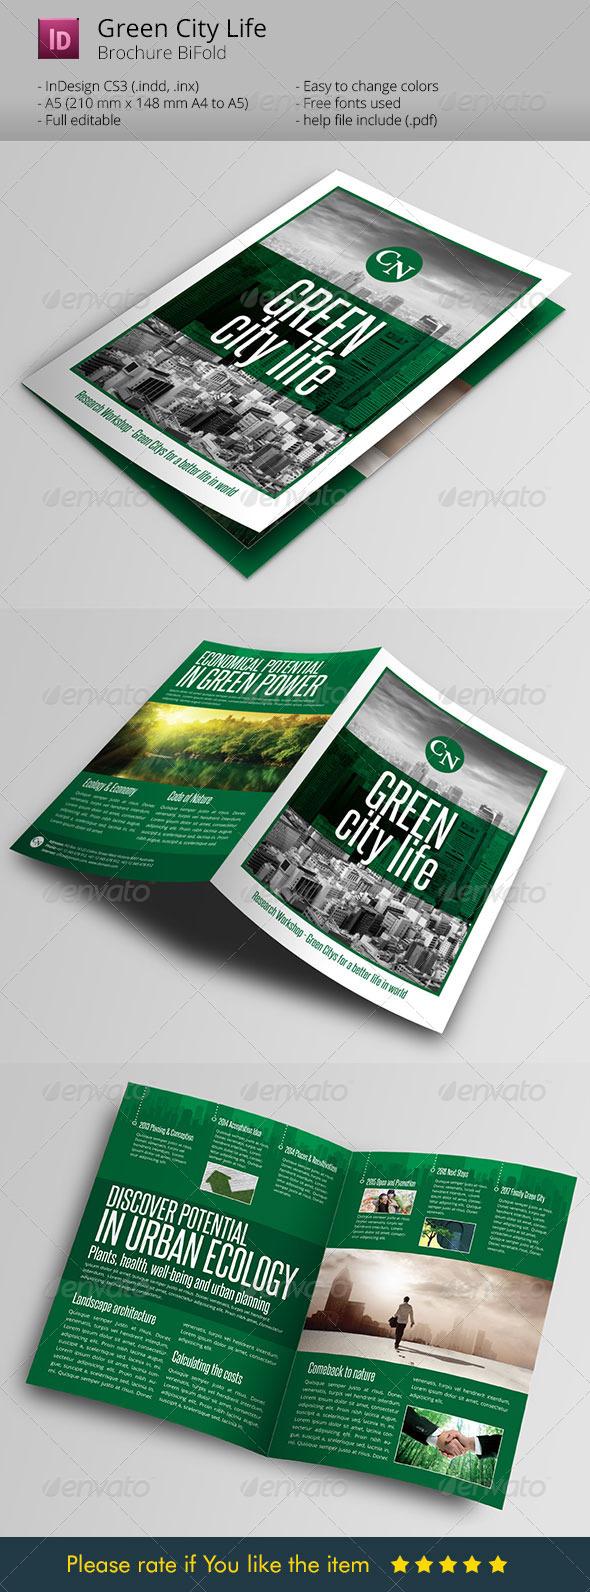 Green City Life Brochure Indesign Template - Informational Brochures